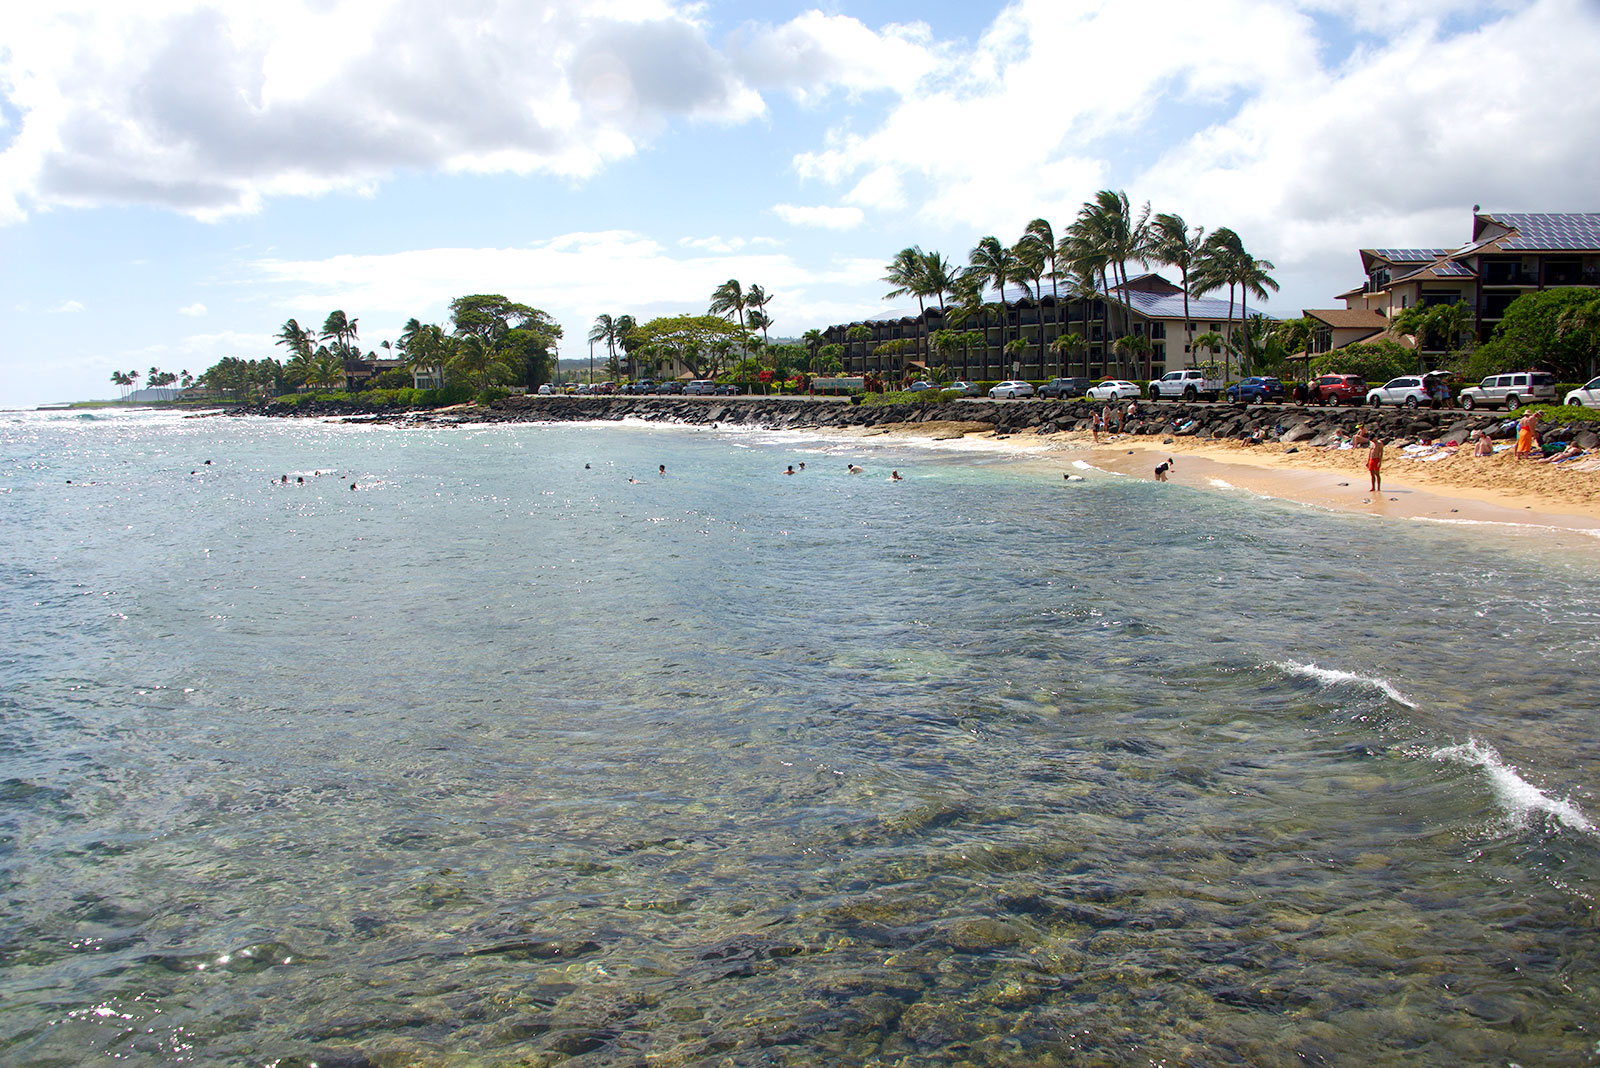 Lawai-Beach-Resort-Kauai-35